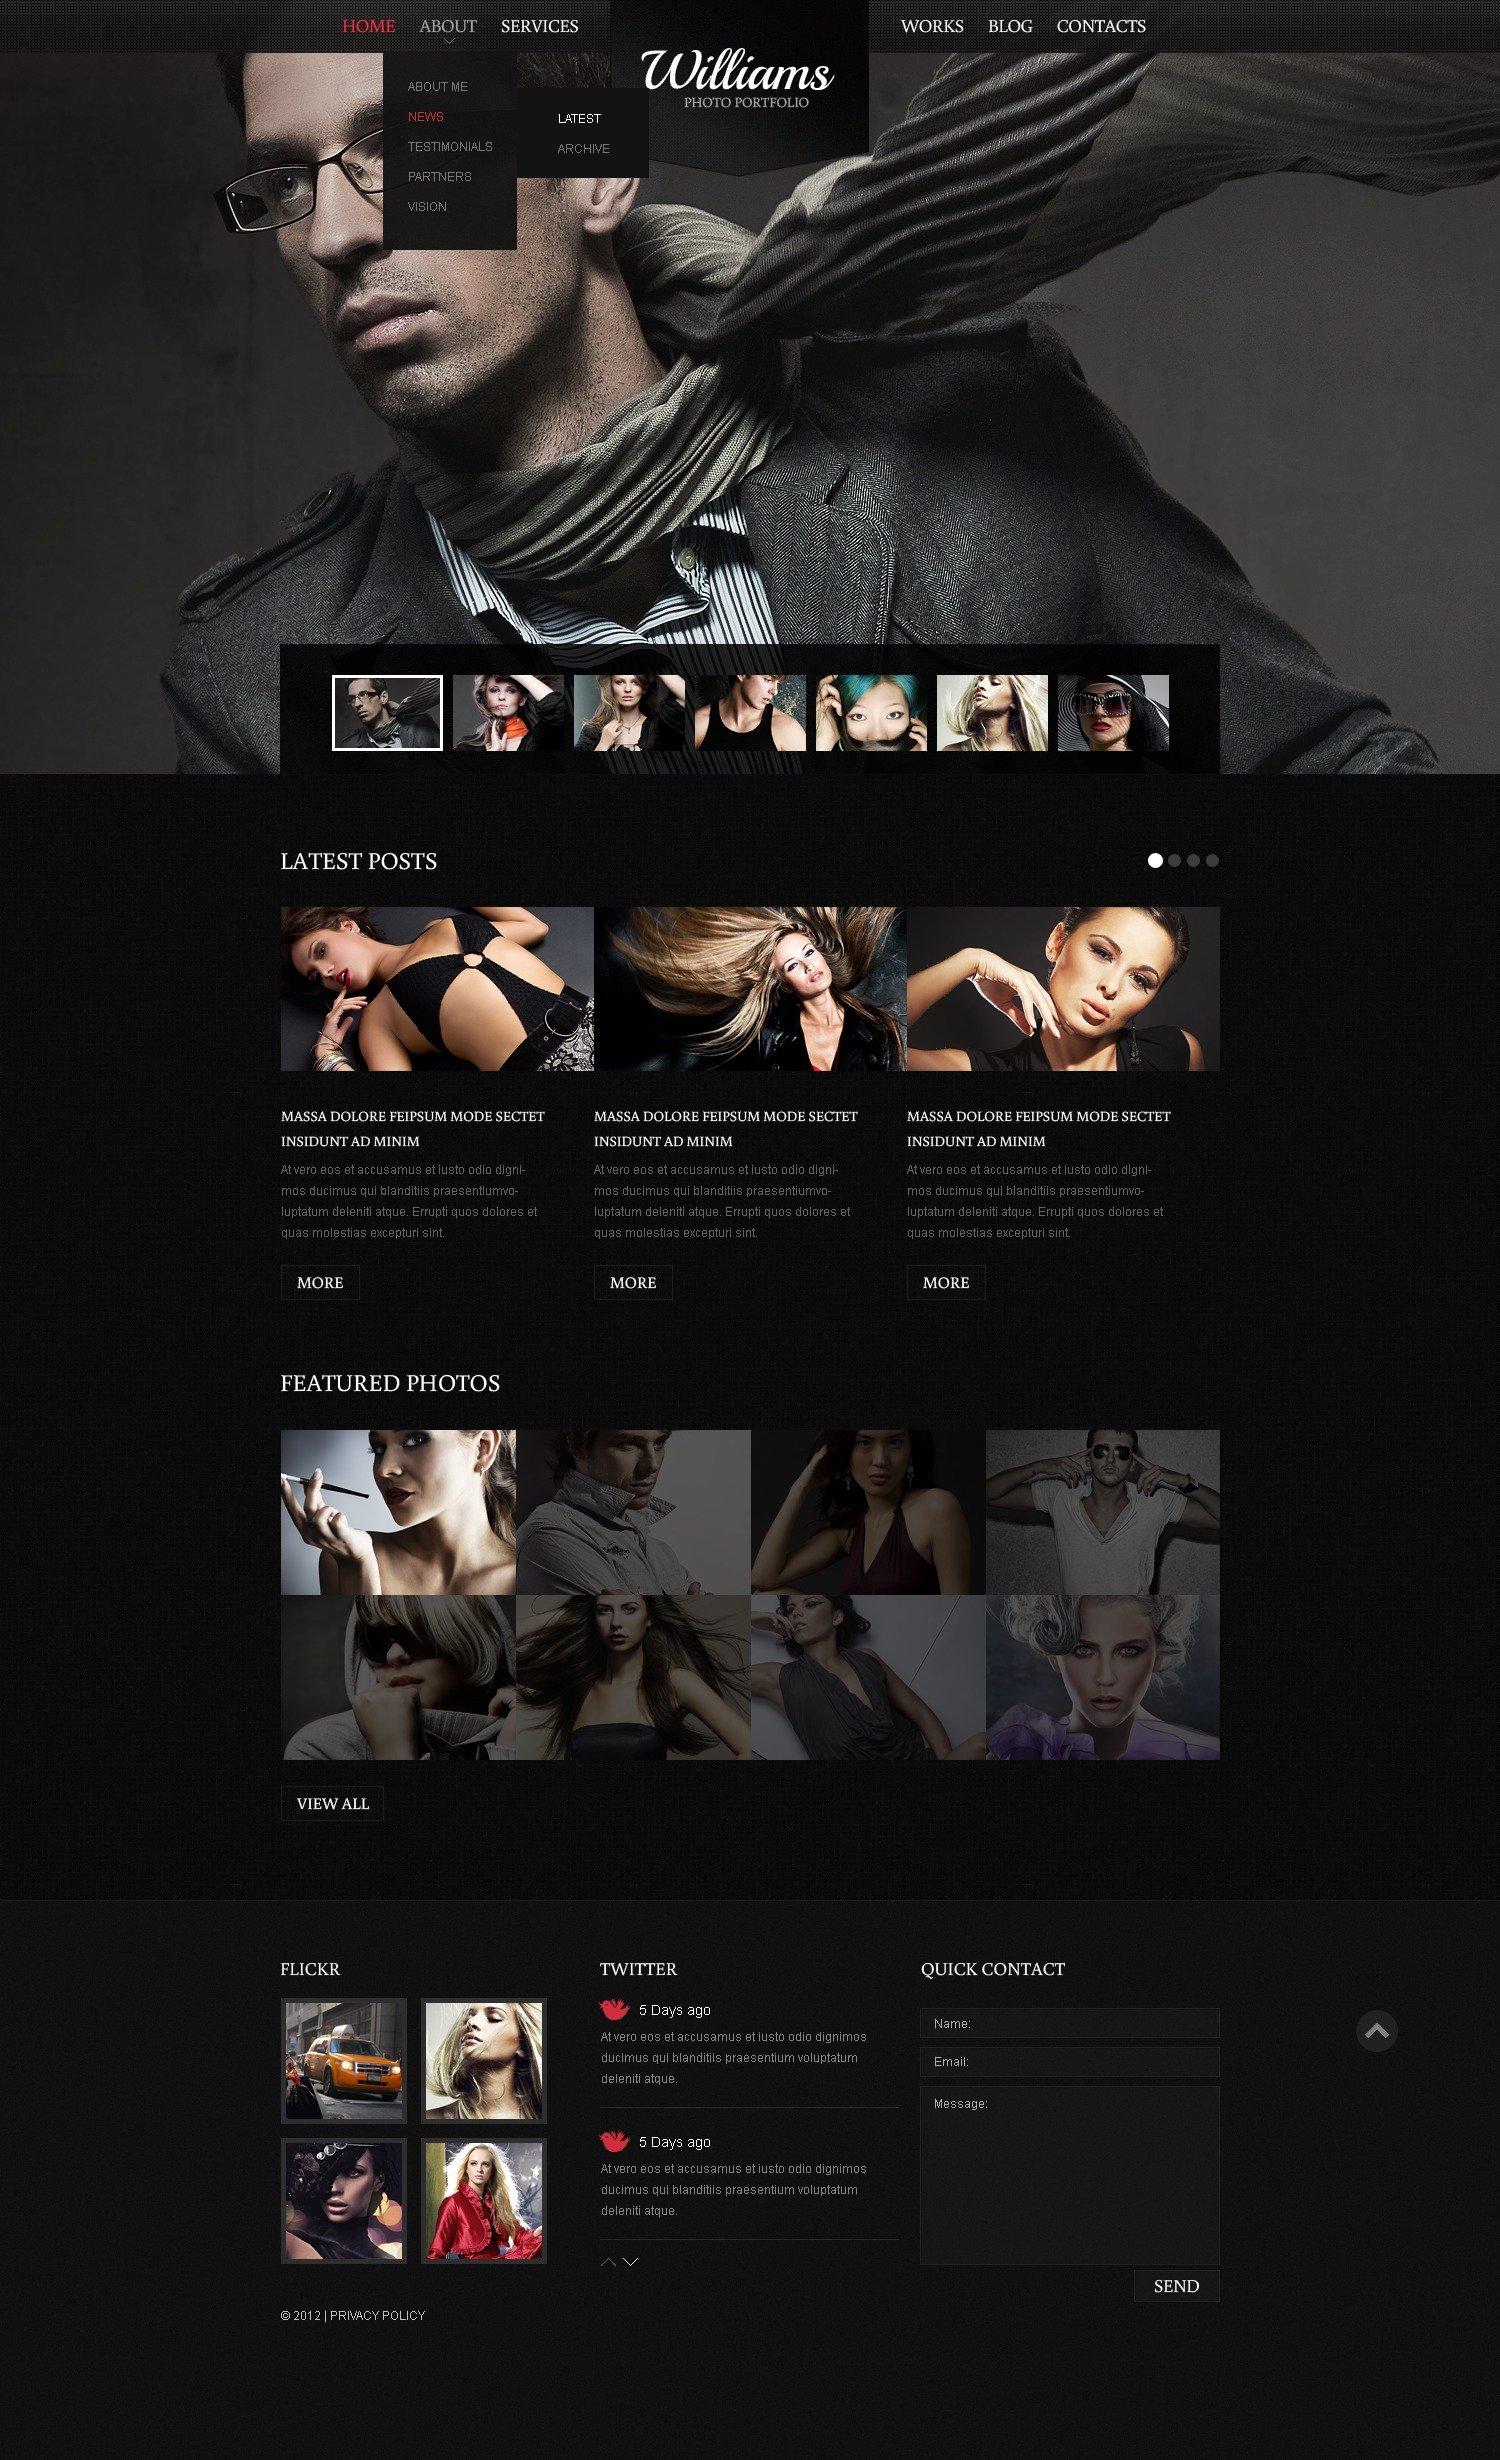 Szablon Drupal Black Photography #42156 - zrzut ekranu